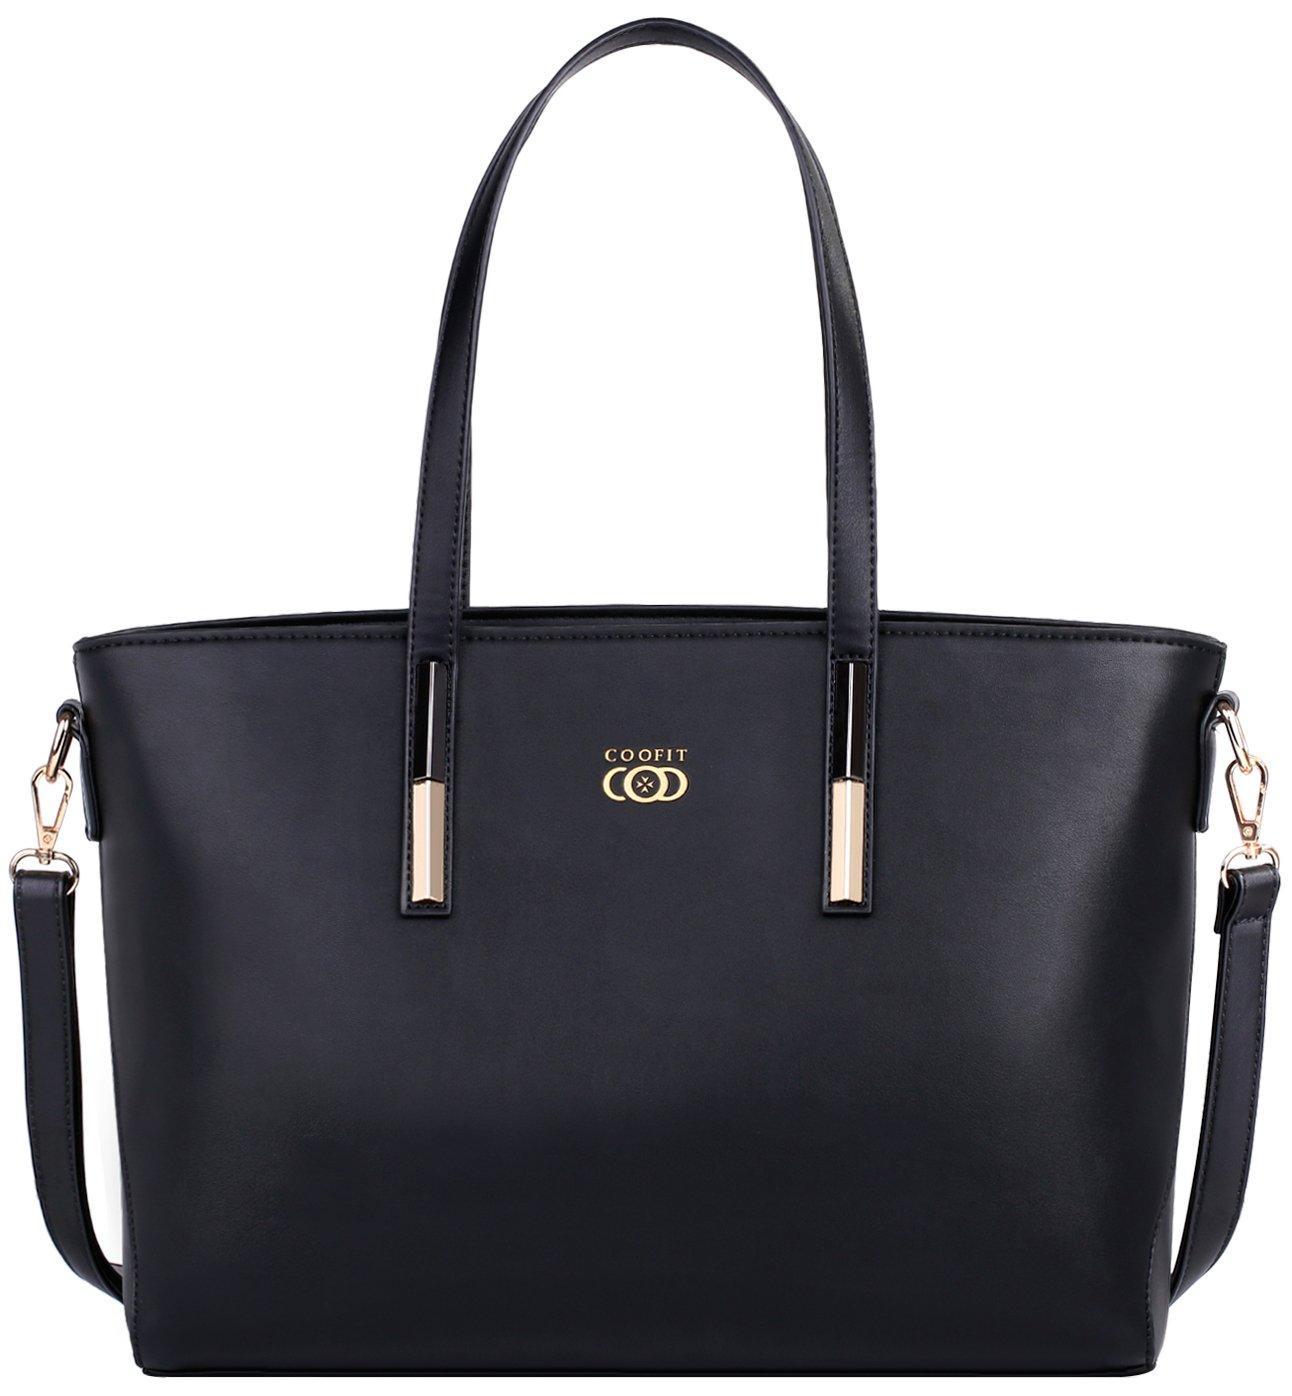 COOFIT Lady Purses and Handbags Little Bow Leisure Top-Handle Bags Shoulder Bag Purse (Coofit Black)